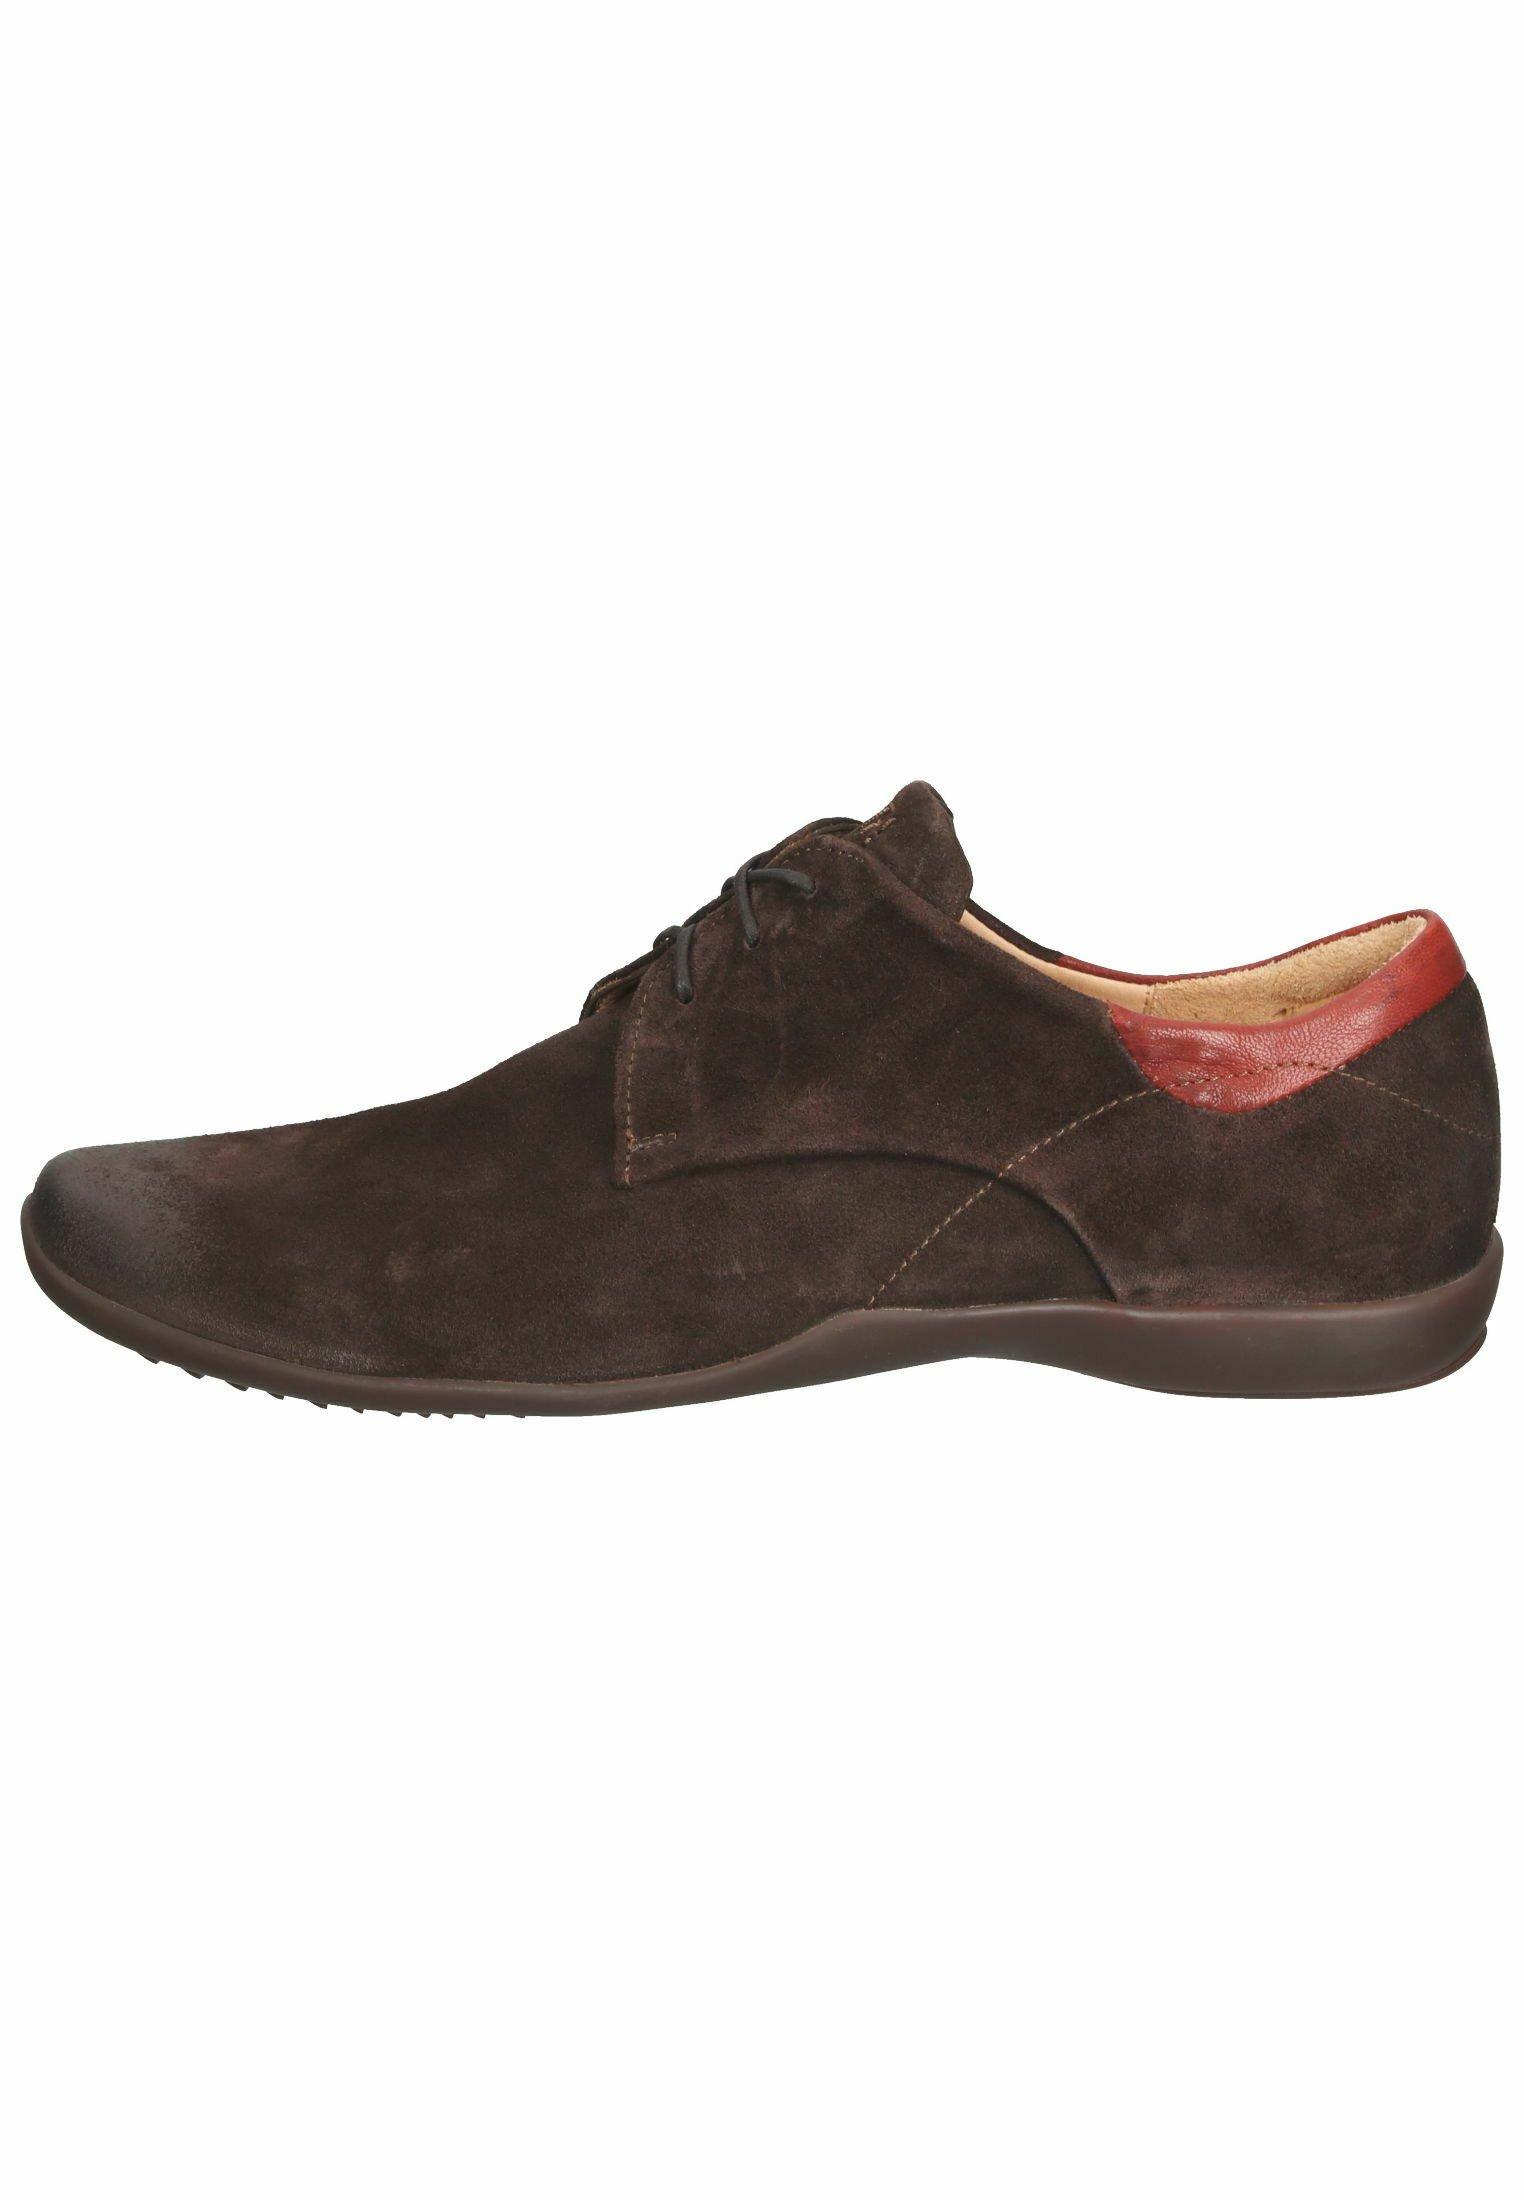 Homme Chaussures à lacets - mocca/kombi